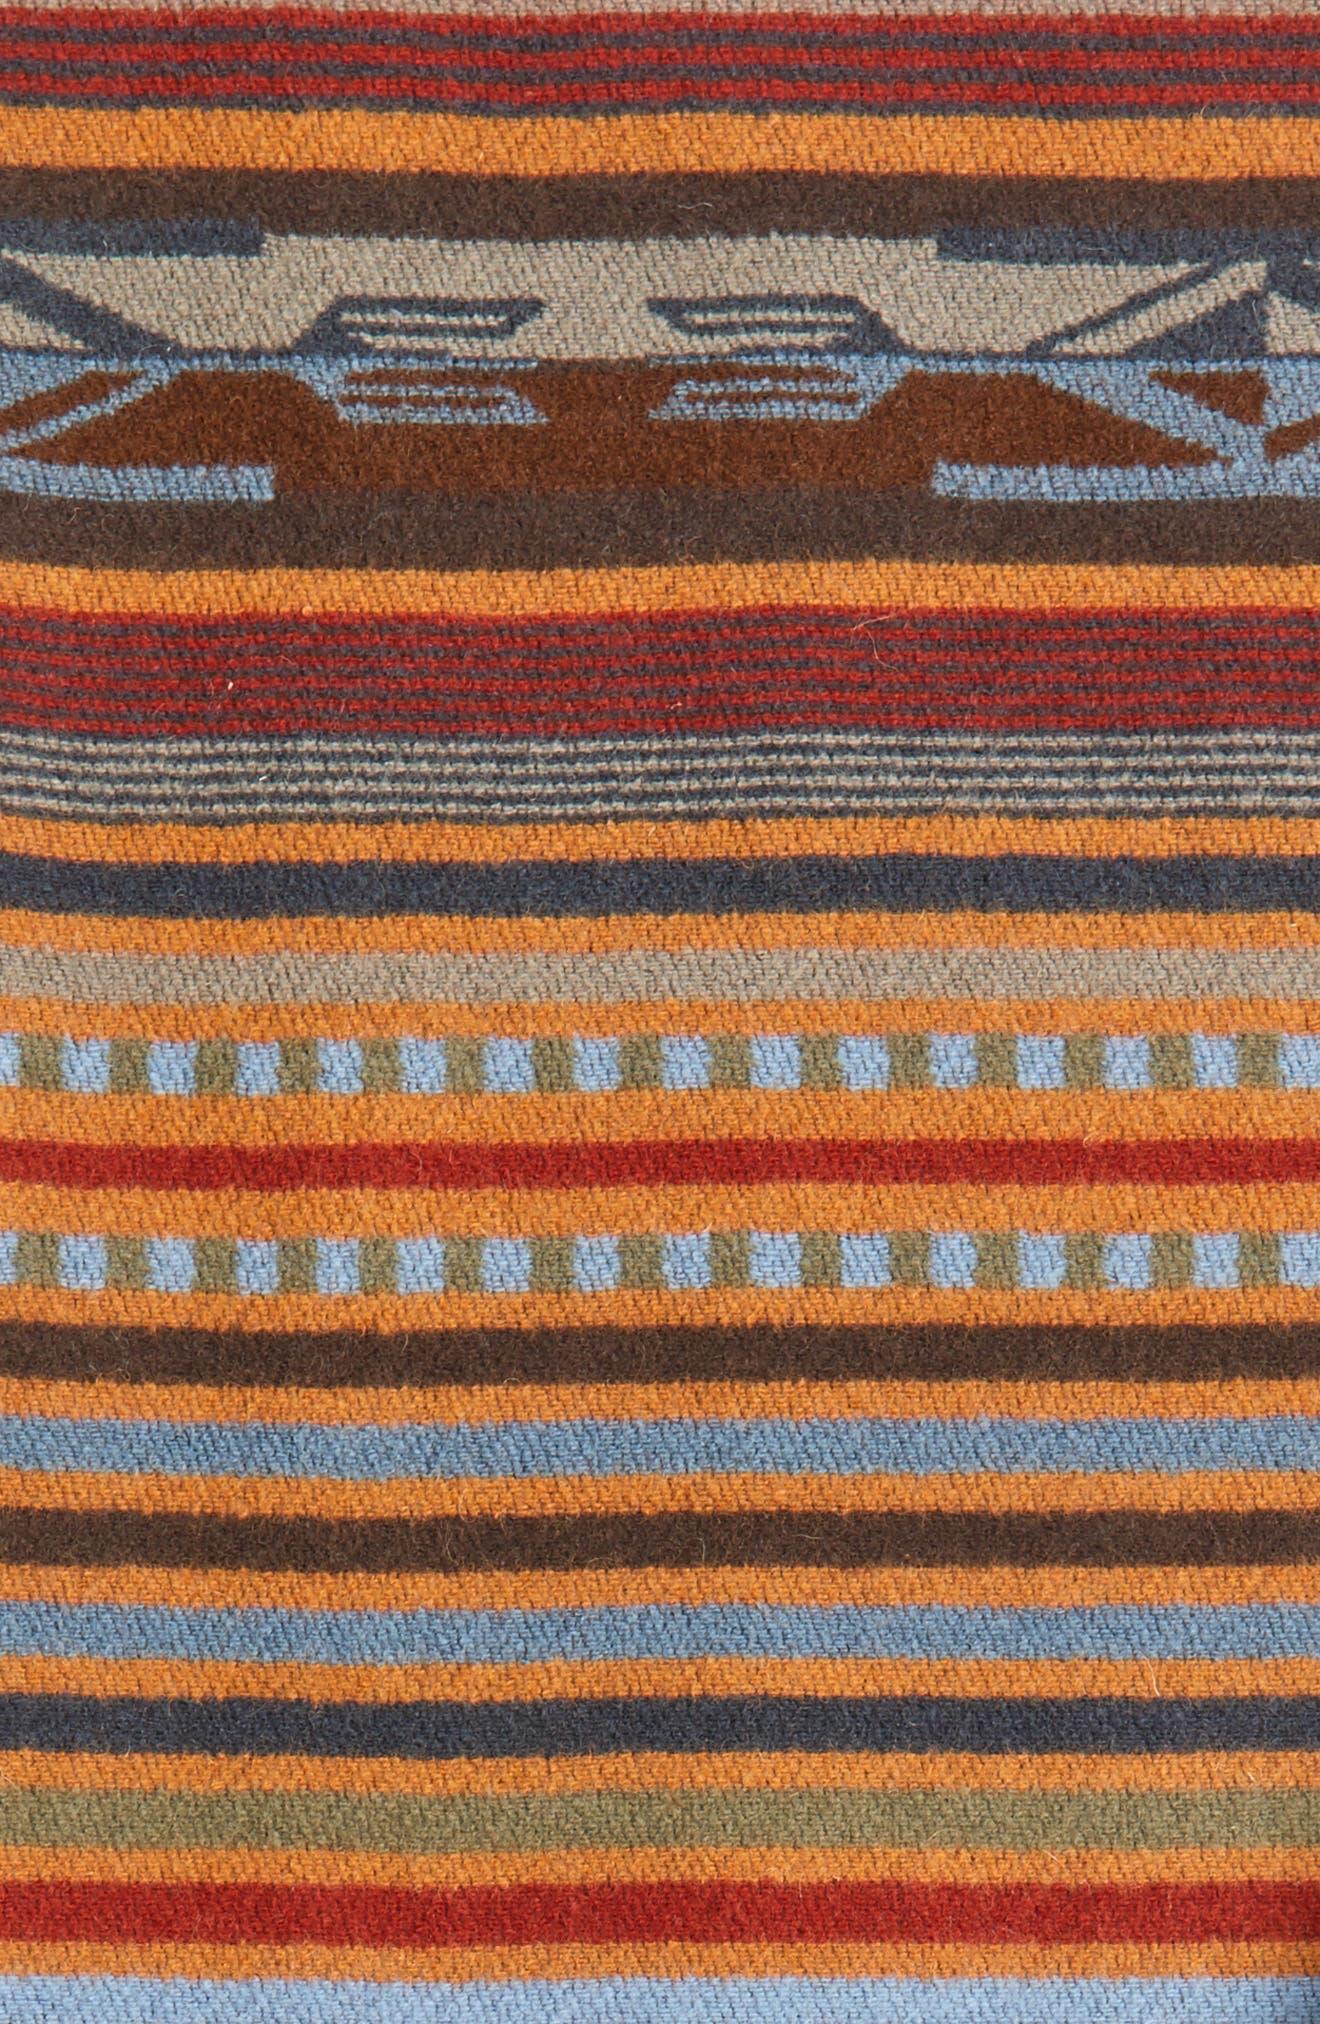 'Chimayo' Fringe Wool Throw,                             Alternate thumbnail 2, color,                             200